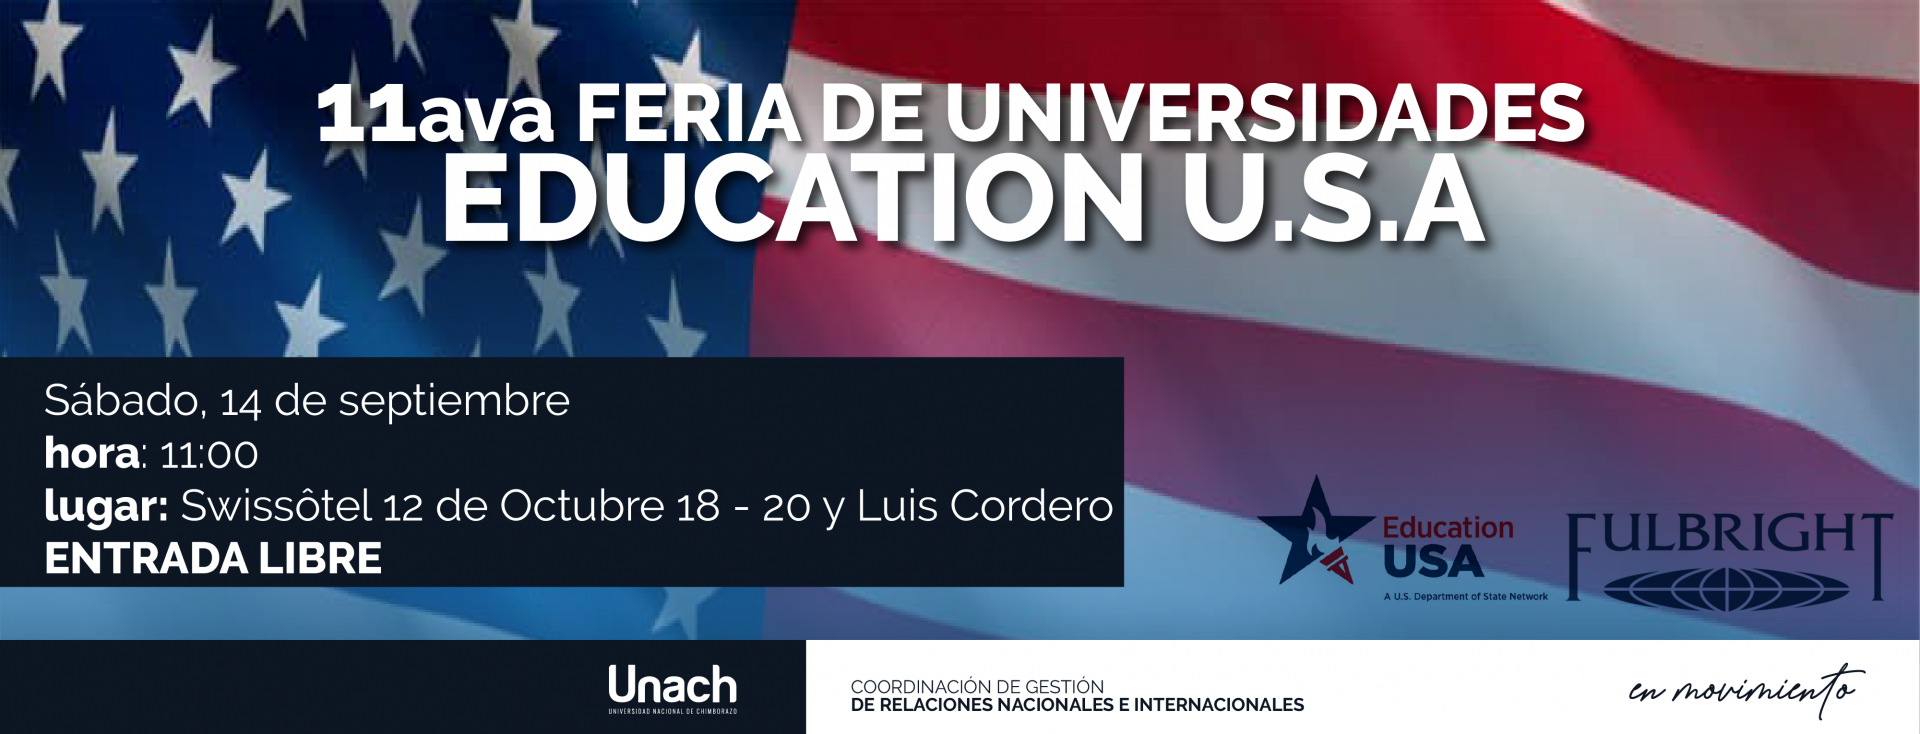 PRIMERA FERIA DE UNIVERSIDADES  EDUCATION U.S.A